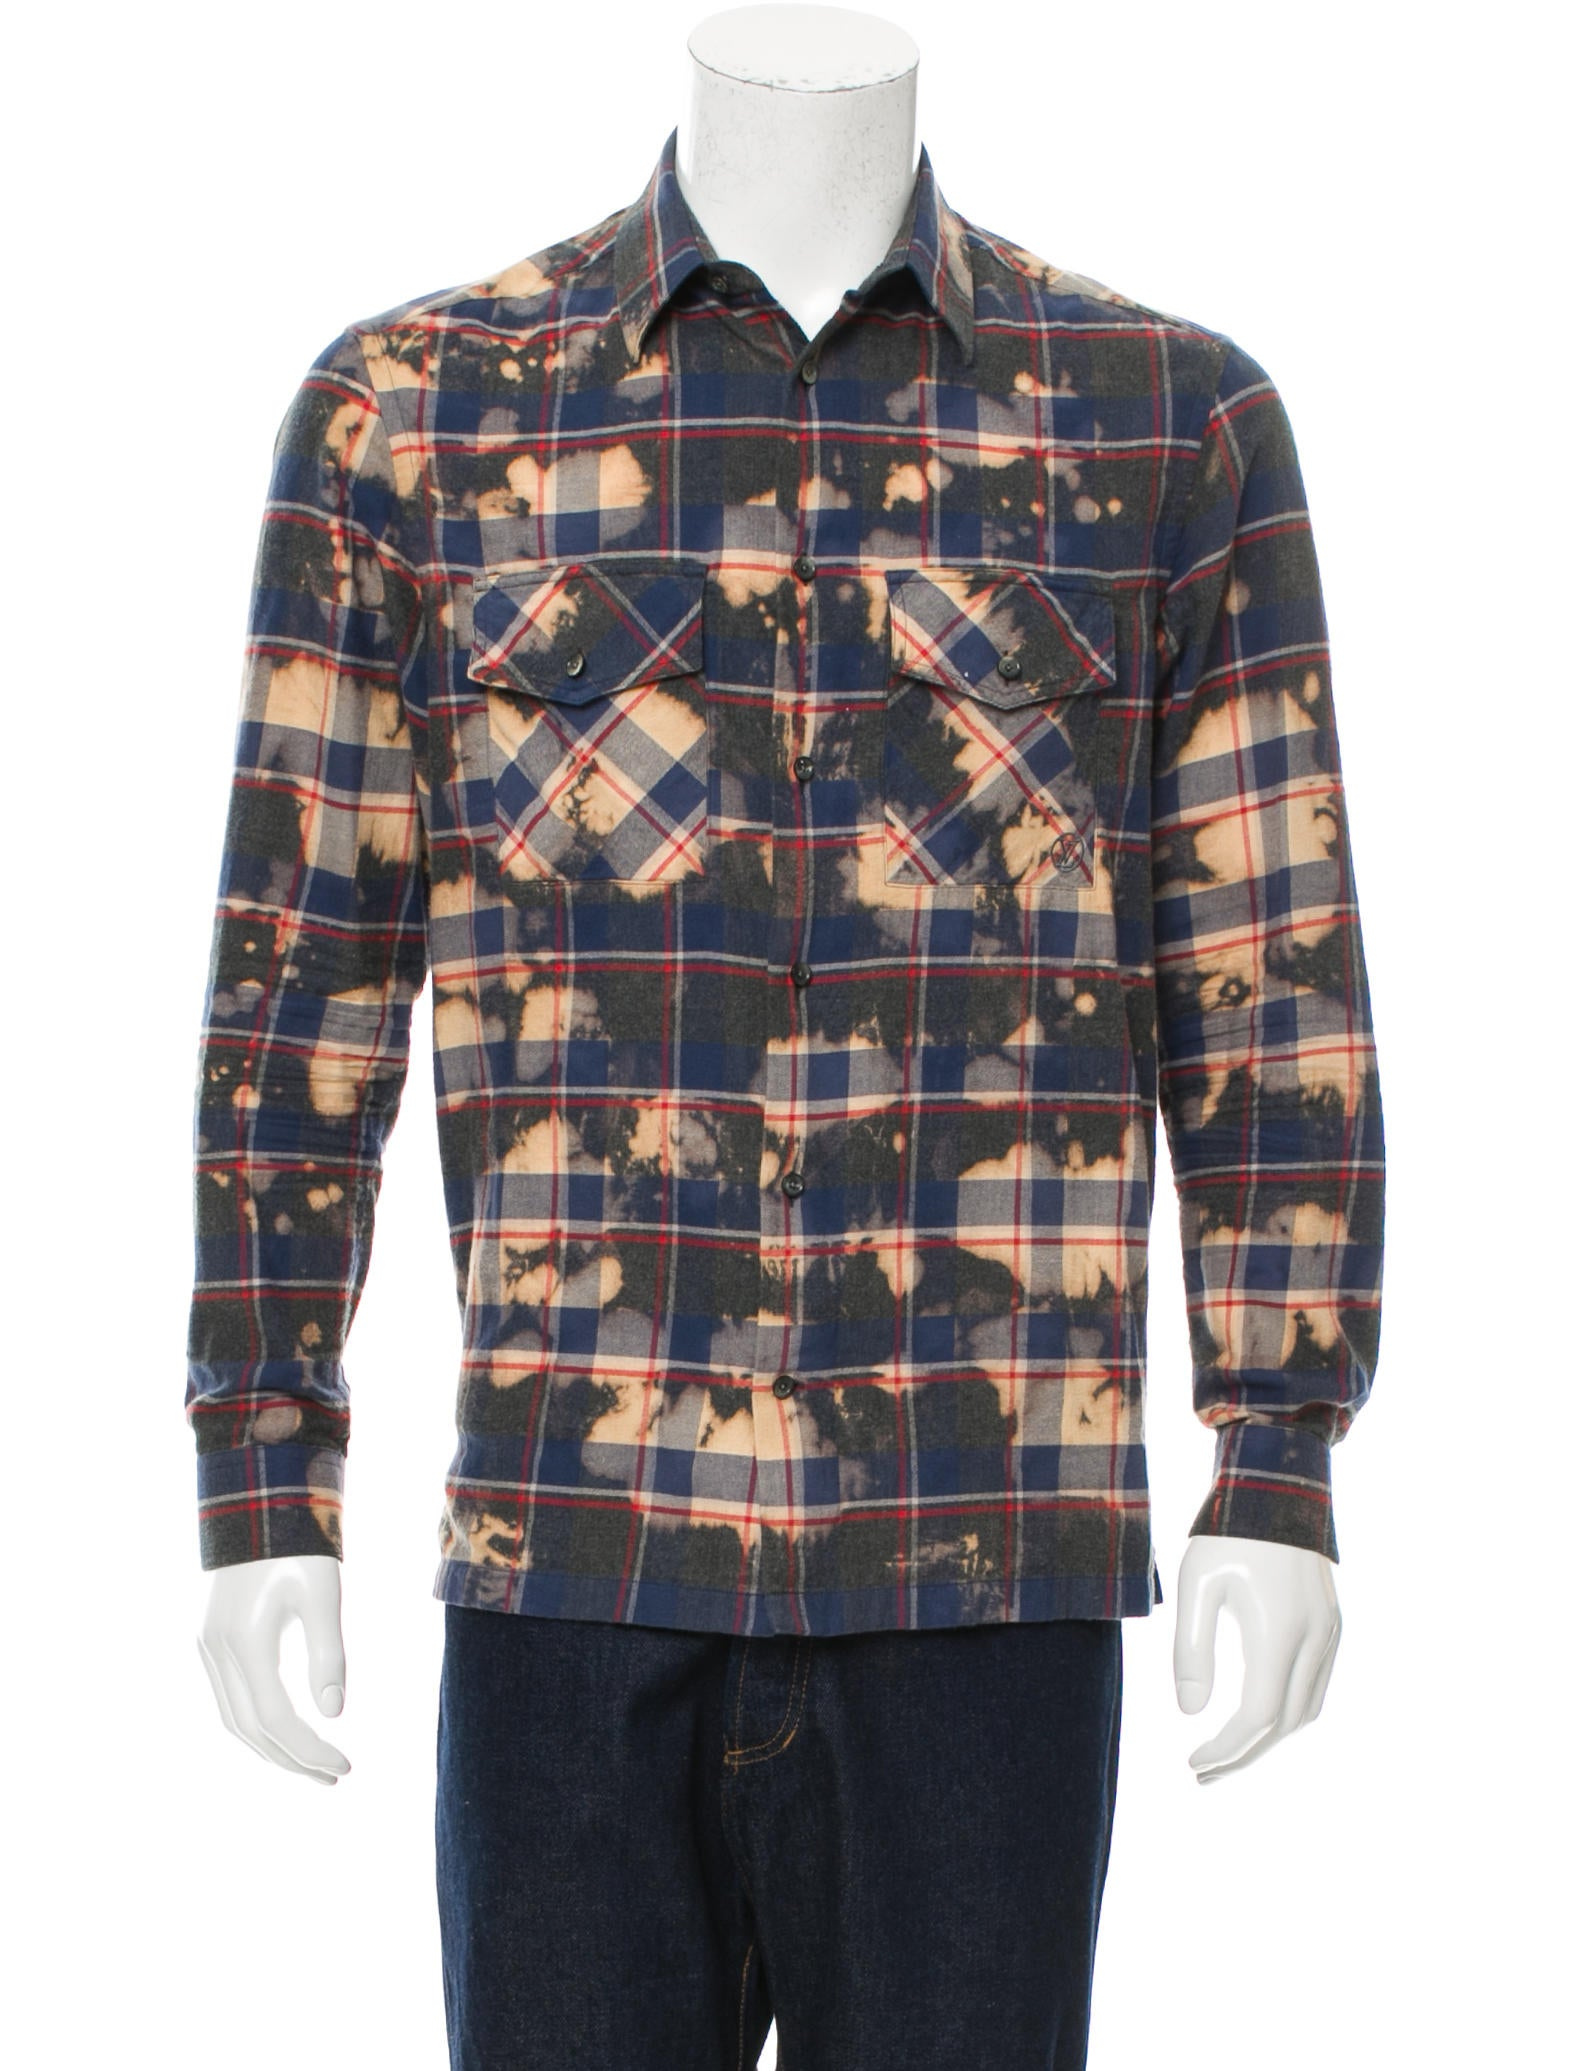 f2e57e5a267e Louis Vuitton Flannel Button-Up Shirt - Clothing - LOU112904